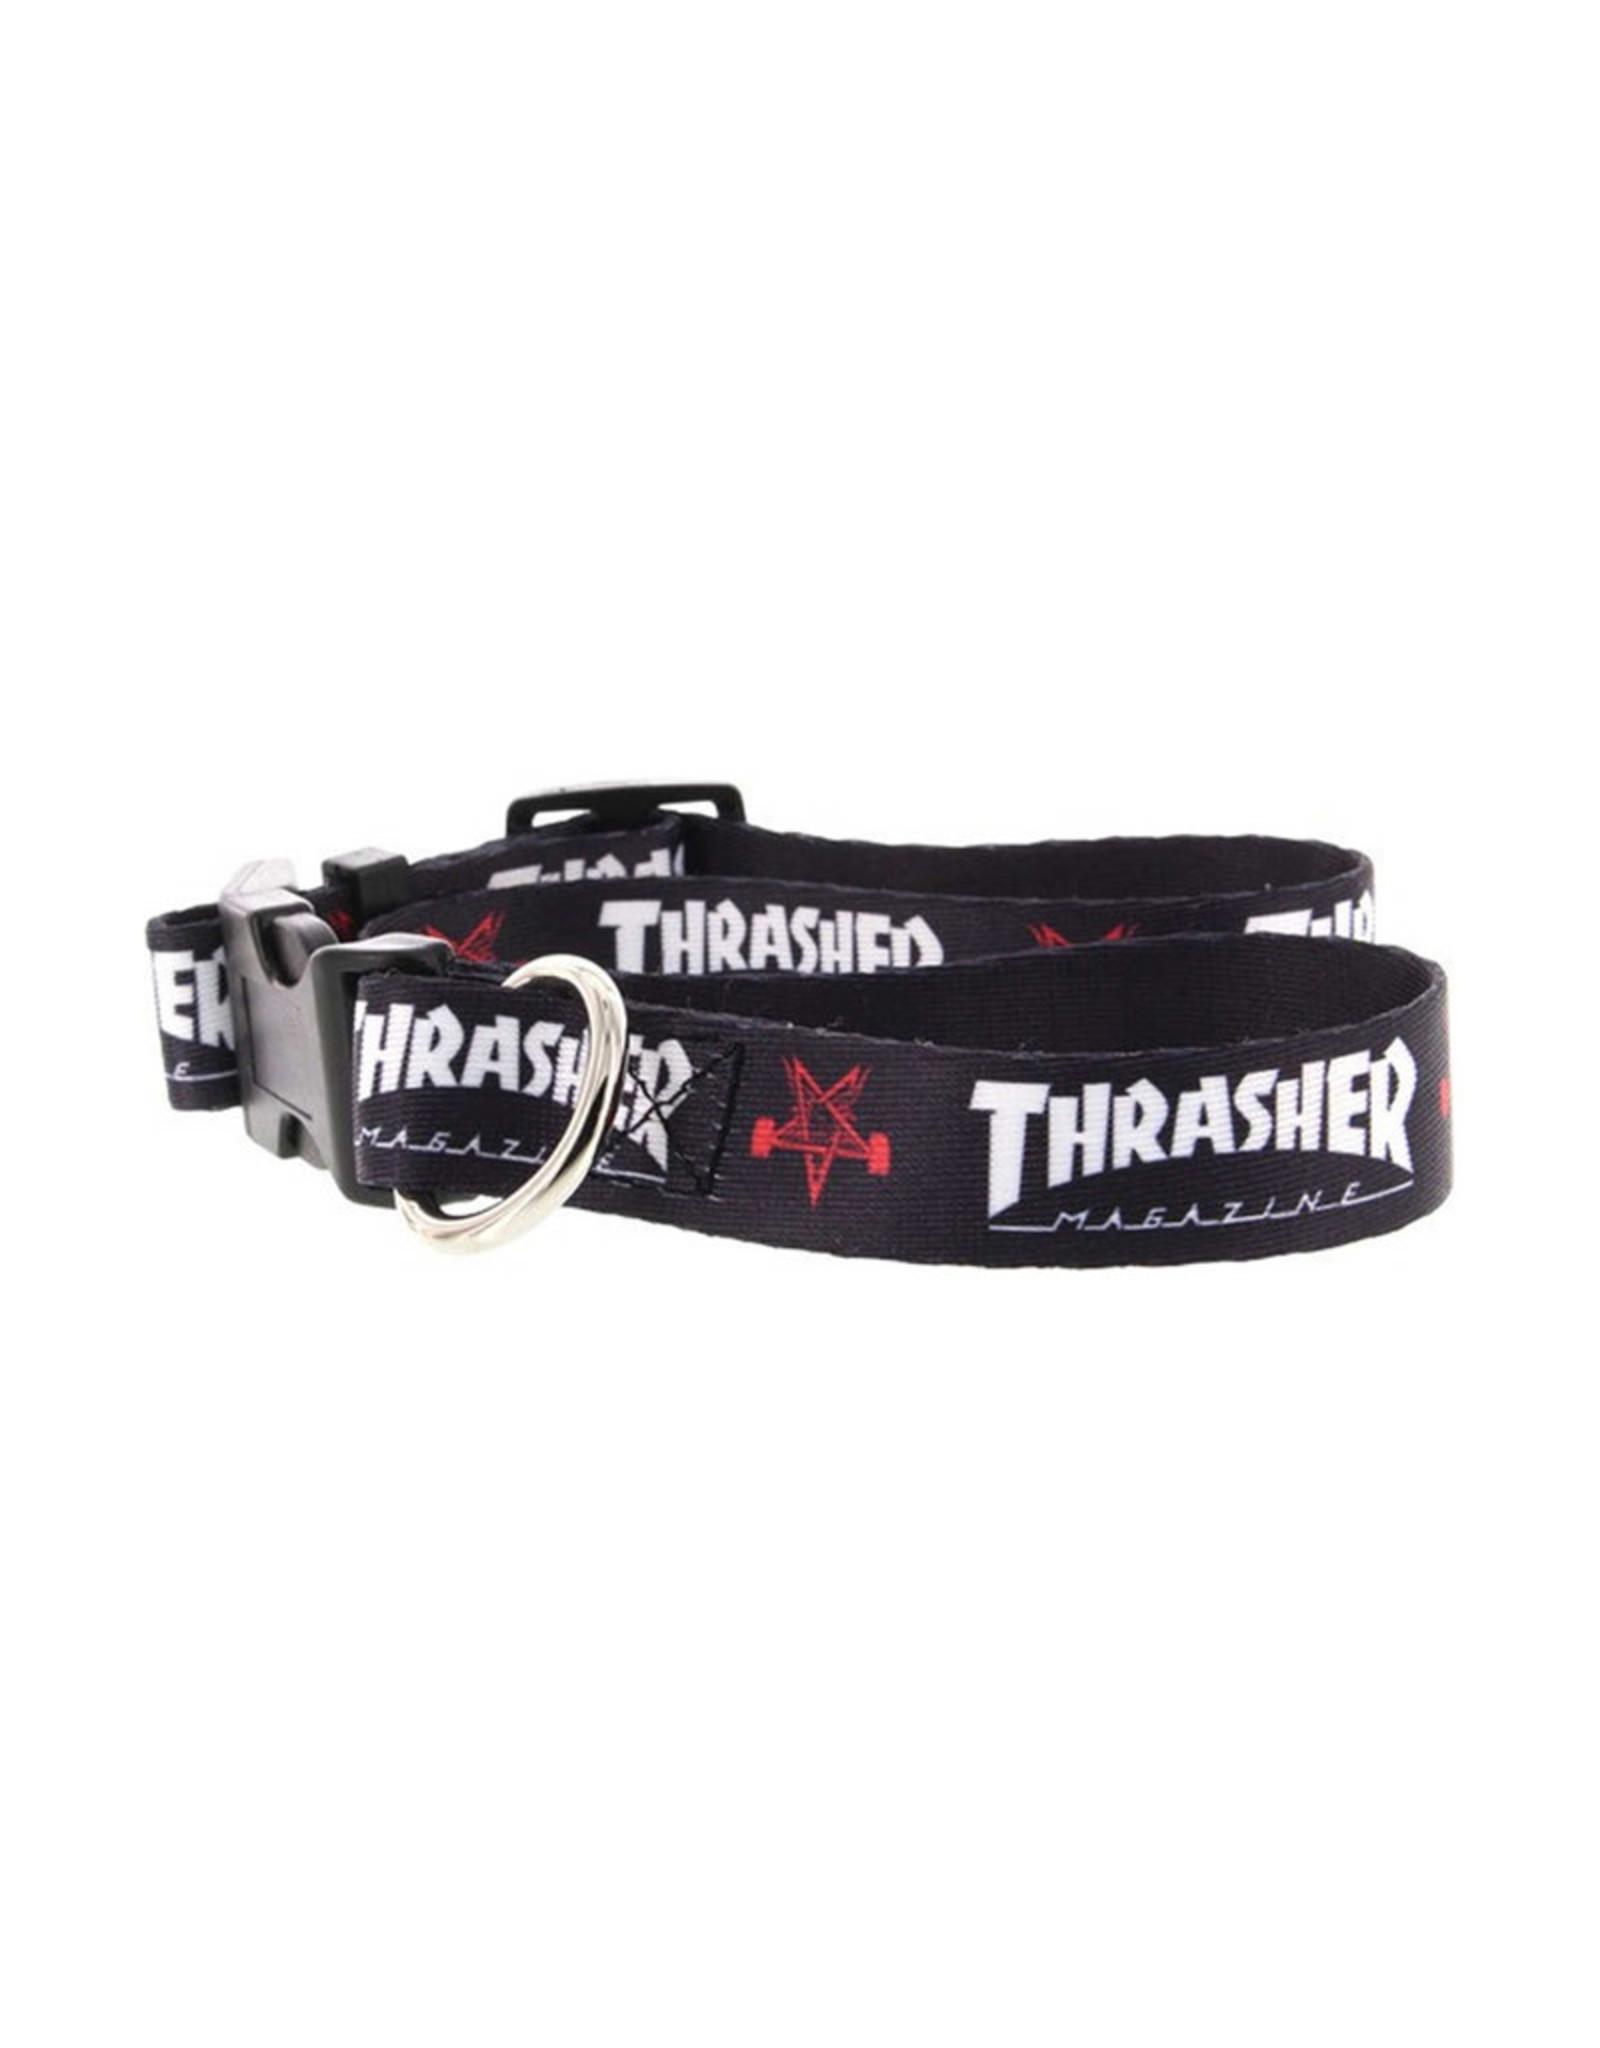 Thrasher Thrasher Dog Collar (Large)